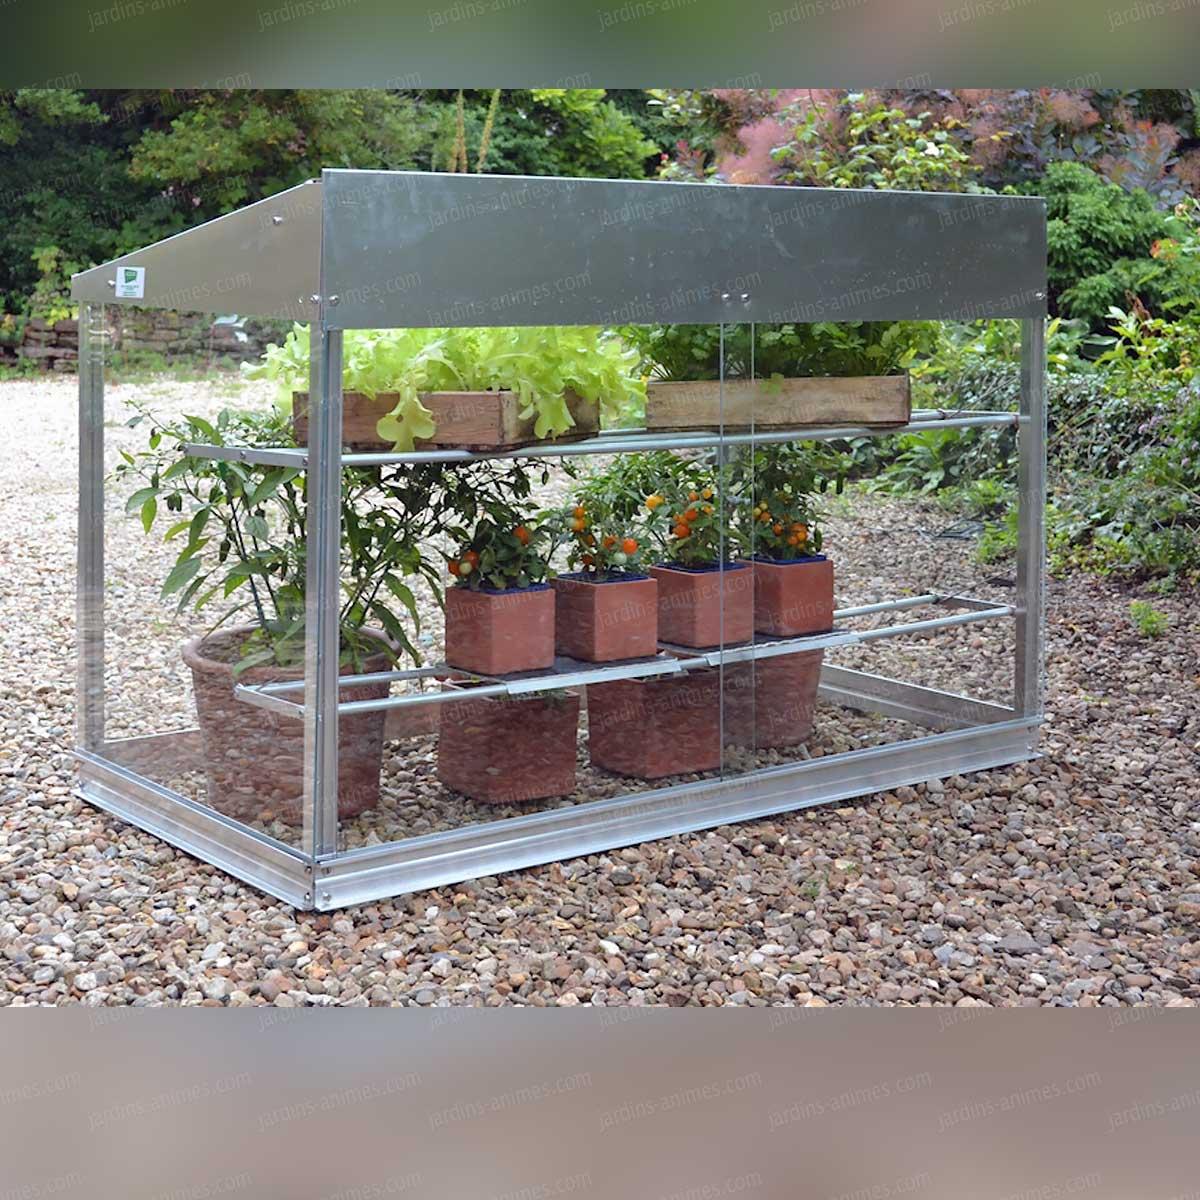 Jardins anim s am nagement du jardin architecture du jardin serre jardin mini serre en verre et for Jardin 0 l4anglaise